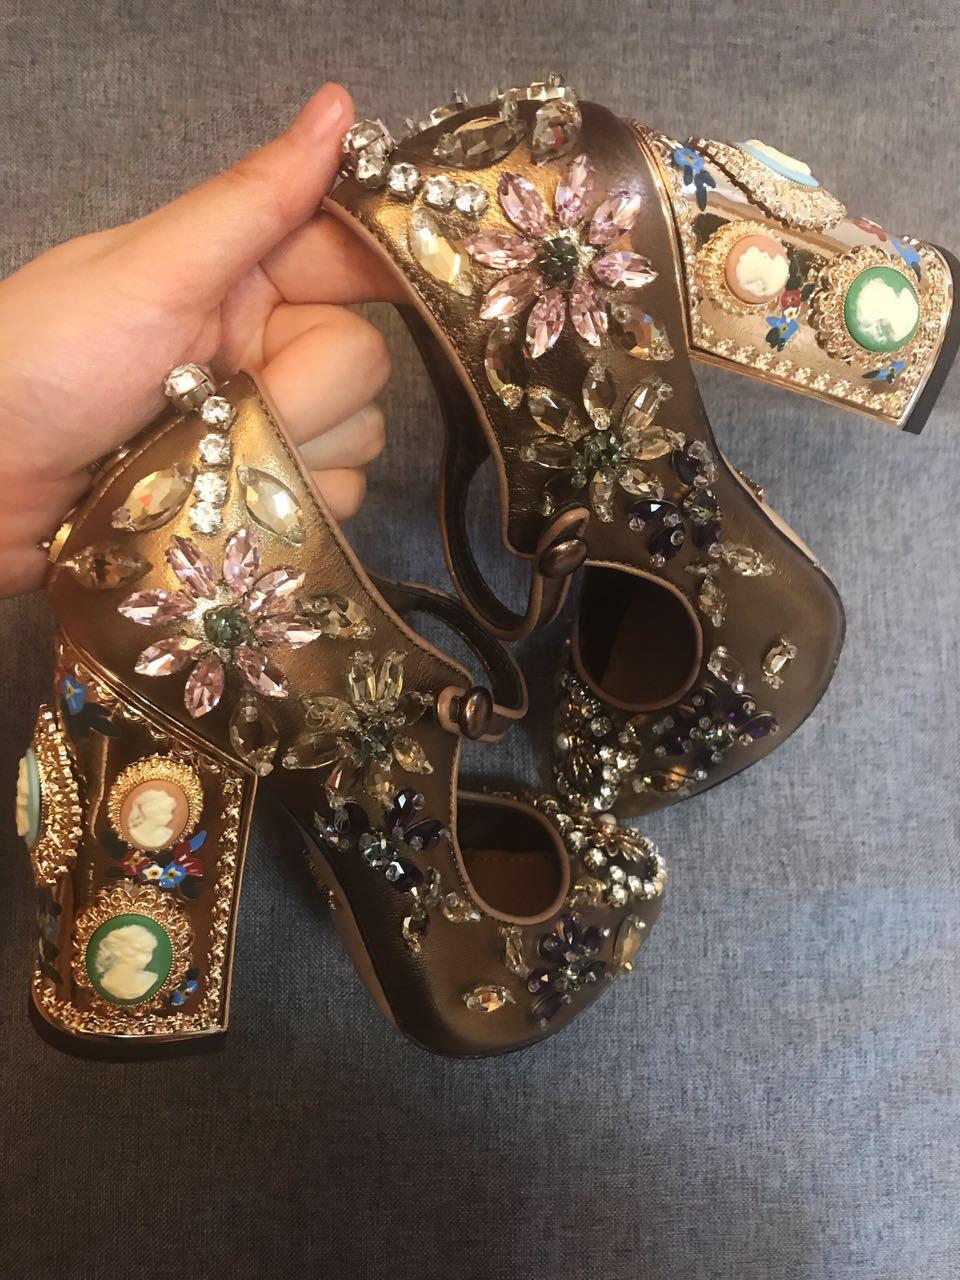 shaduo 171016001 fashion women super beautiful handmade string bead rhinestone genuine leather high heeled shoes, size 34-41